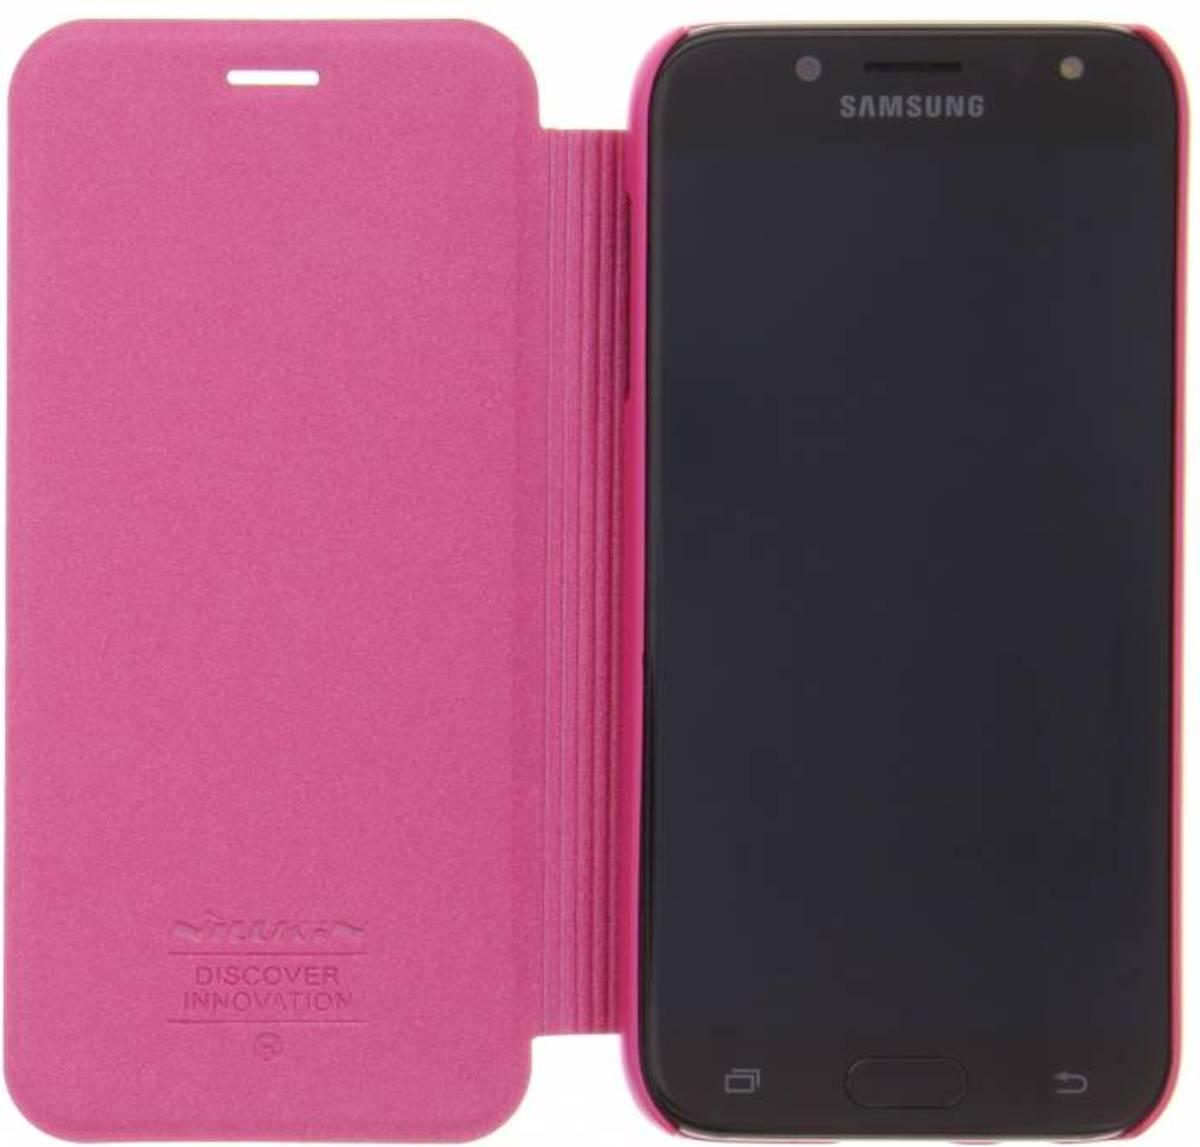 clat Fuchsia Booktype Smart Cover Pour Samsung Galaxy J5 (2017) u1LNvHovzm